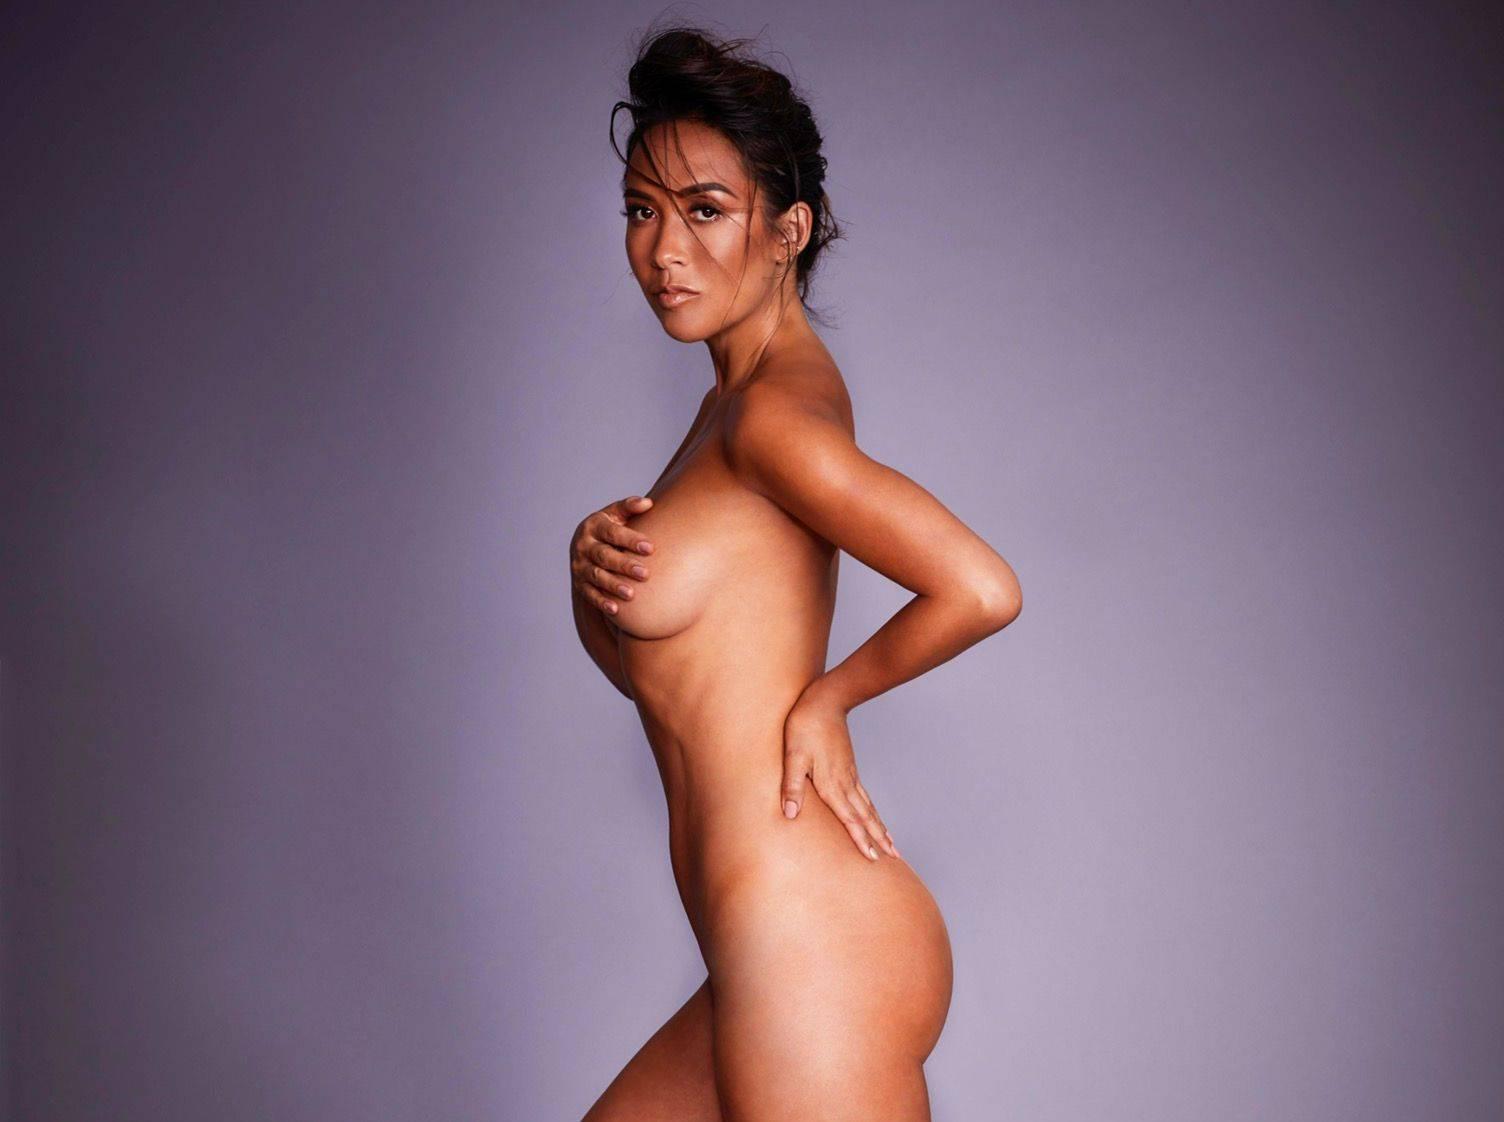 Myleene klass nude photos